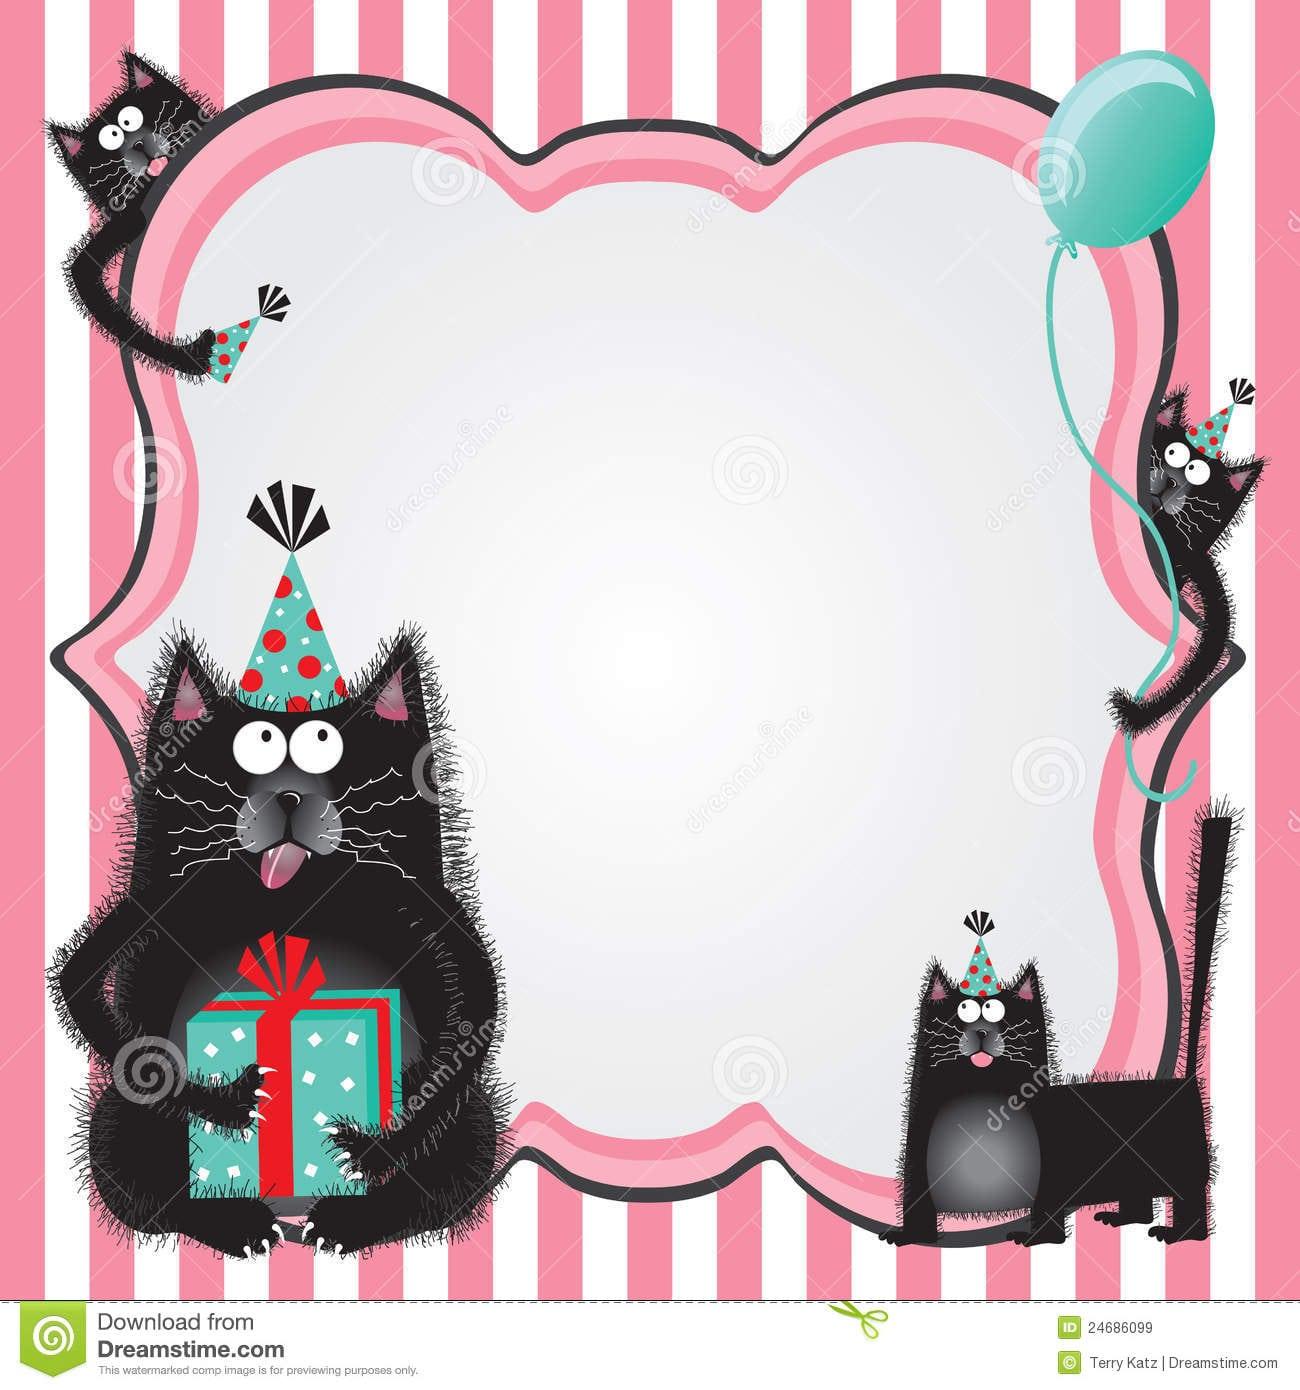 Kitty Cat Birthday Party Invitation Royalty Free Stock Images